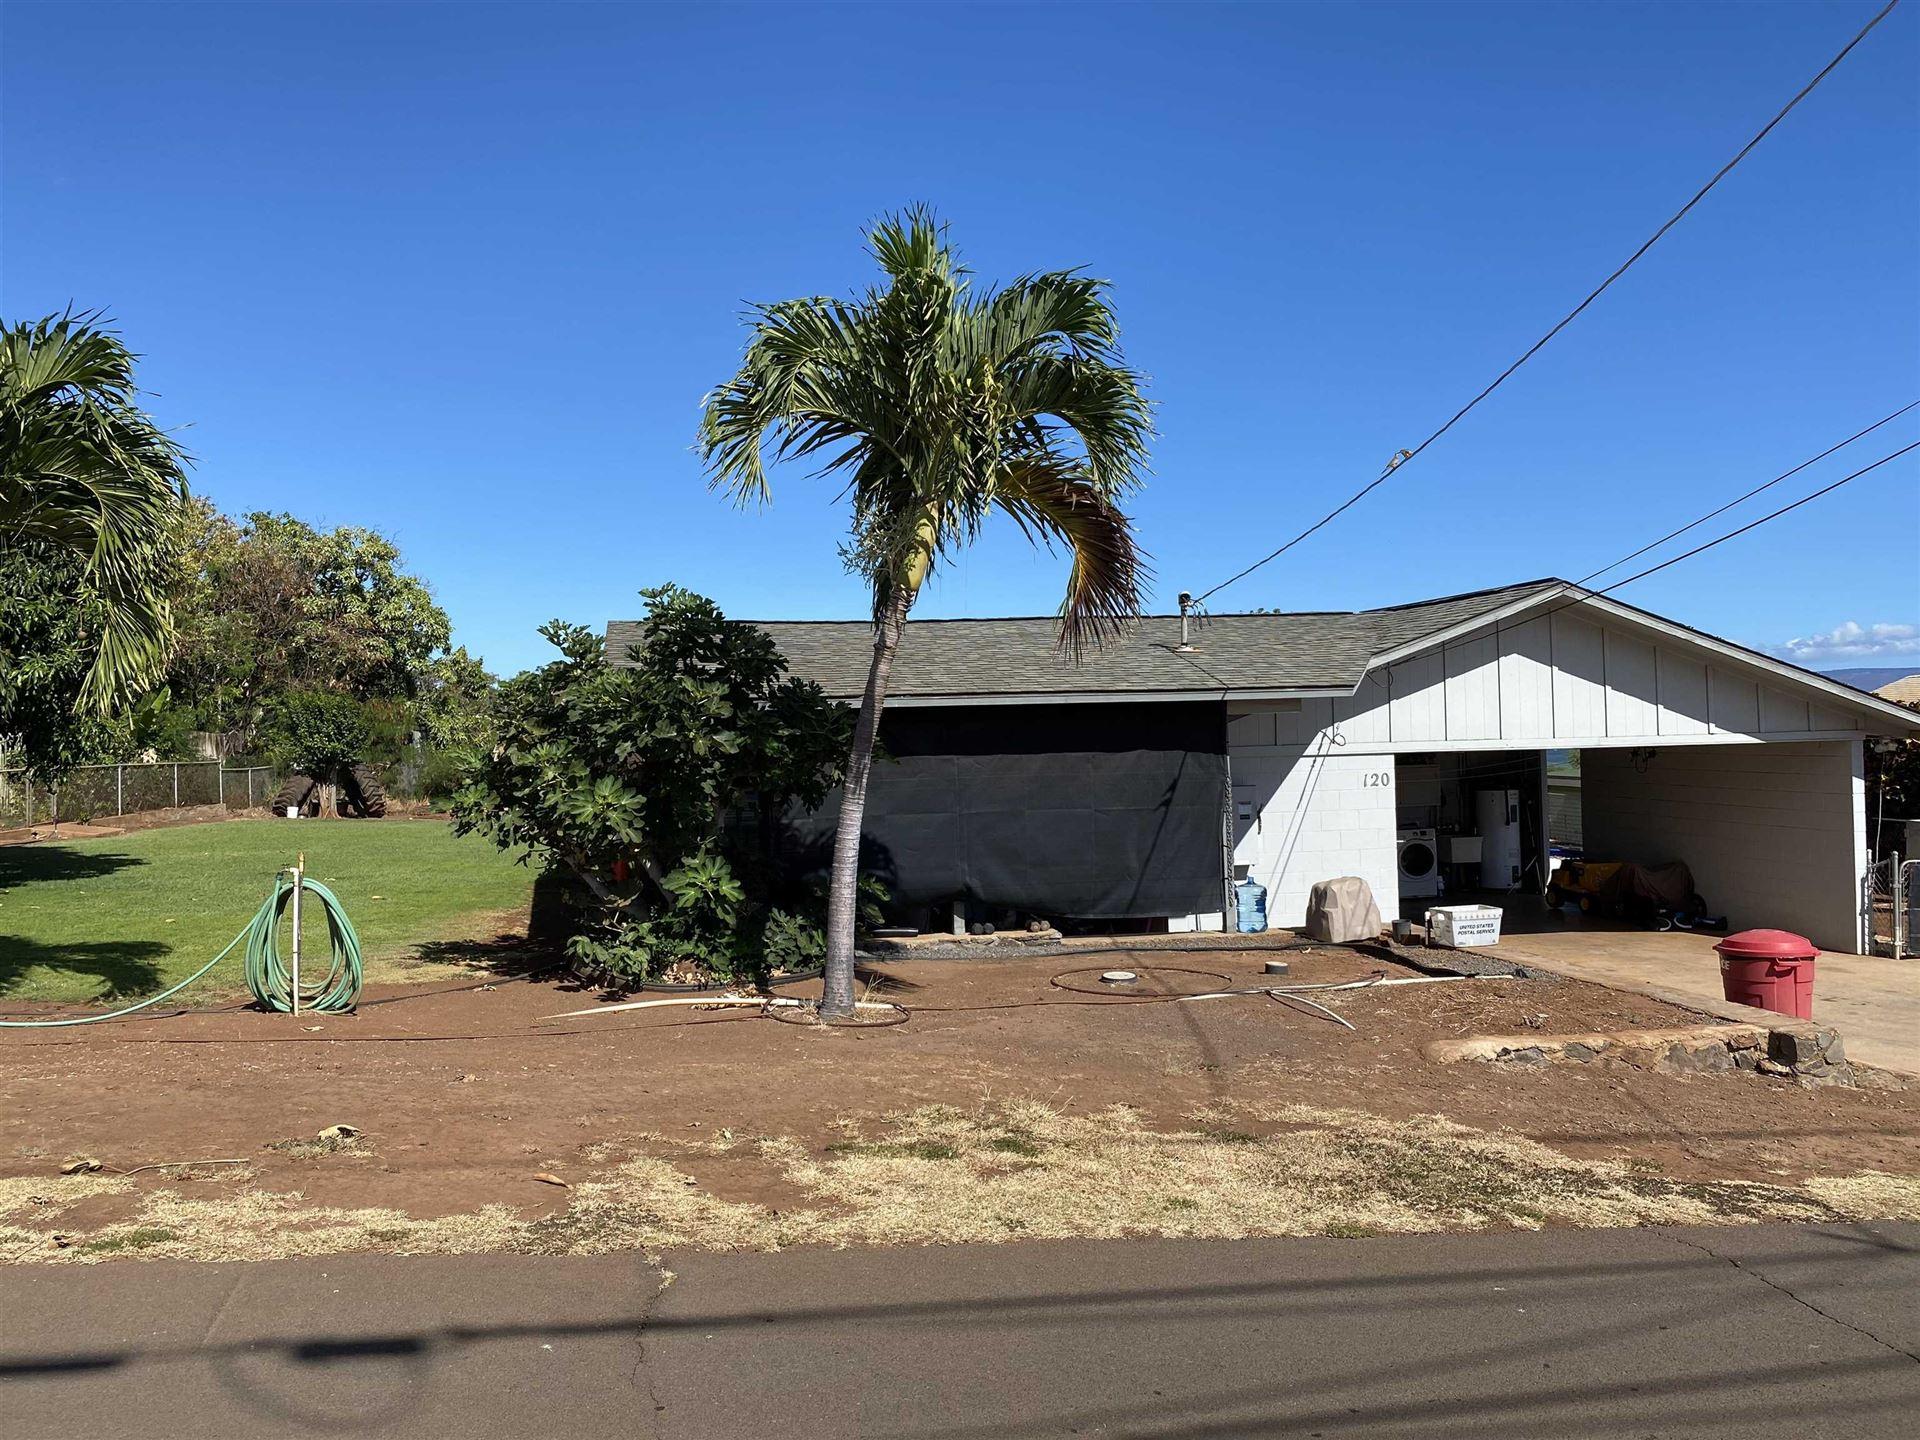 Photo of 120 Aahi St, Kaunakakai, HI 96748 (MLS # 392779)